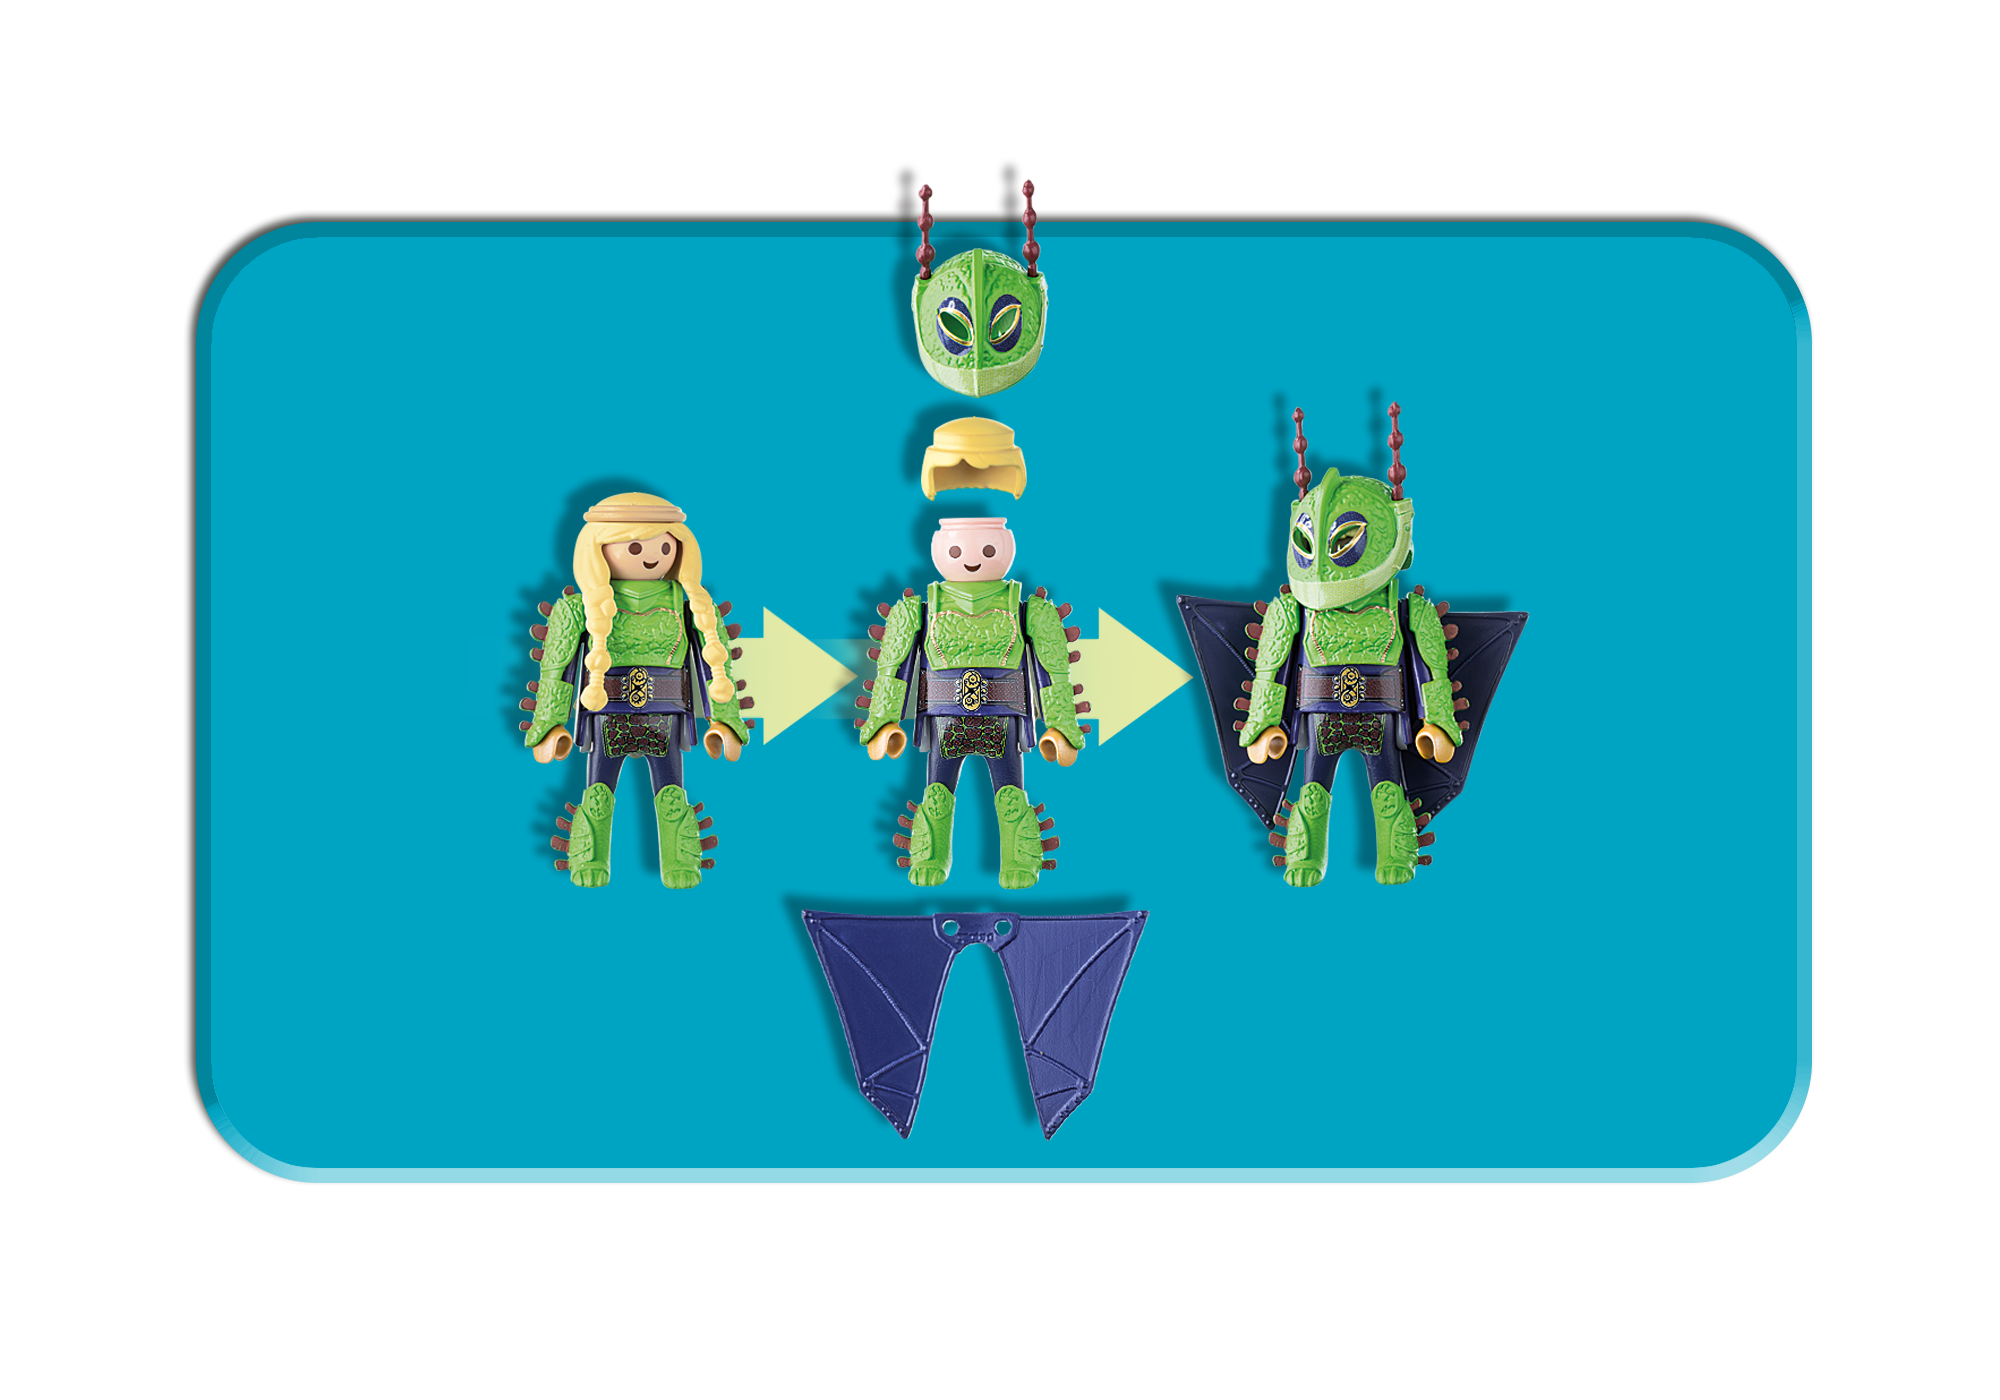 http://media.playmobil.com/i/playmobil/70042_product_extra1/Raffnuss und Taffnuss mit Fluganzug